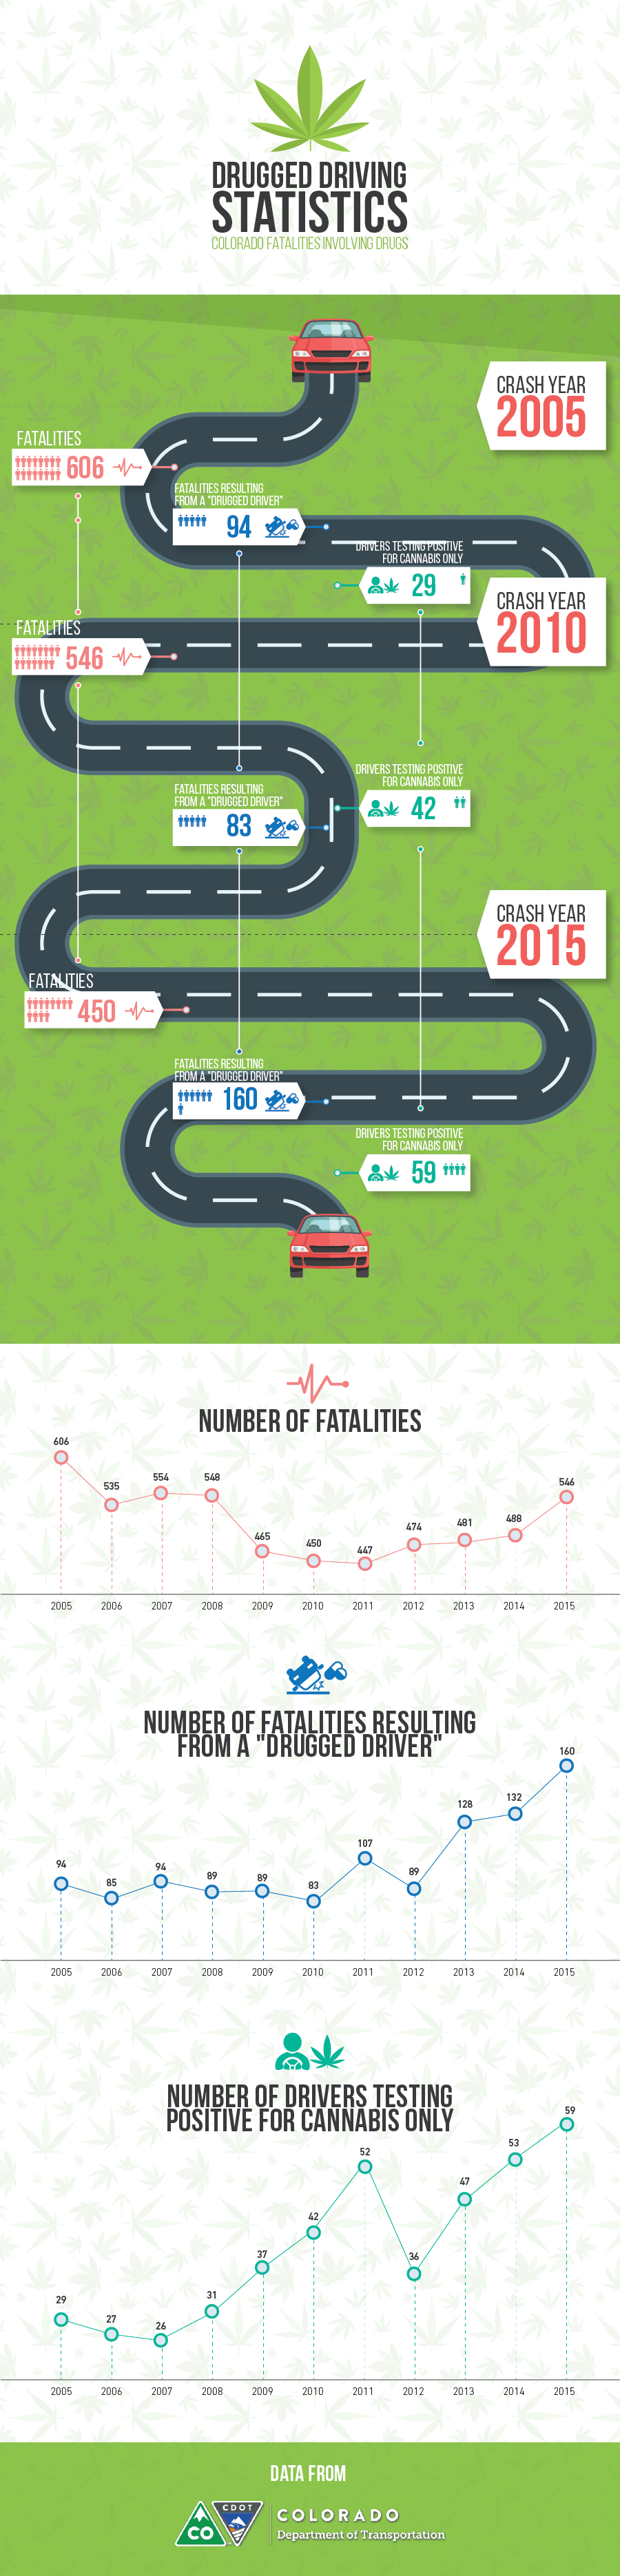 Drugged Driving Statistics in Colorado